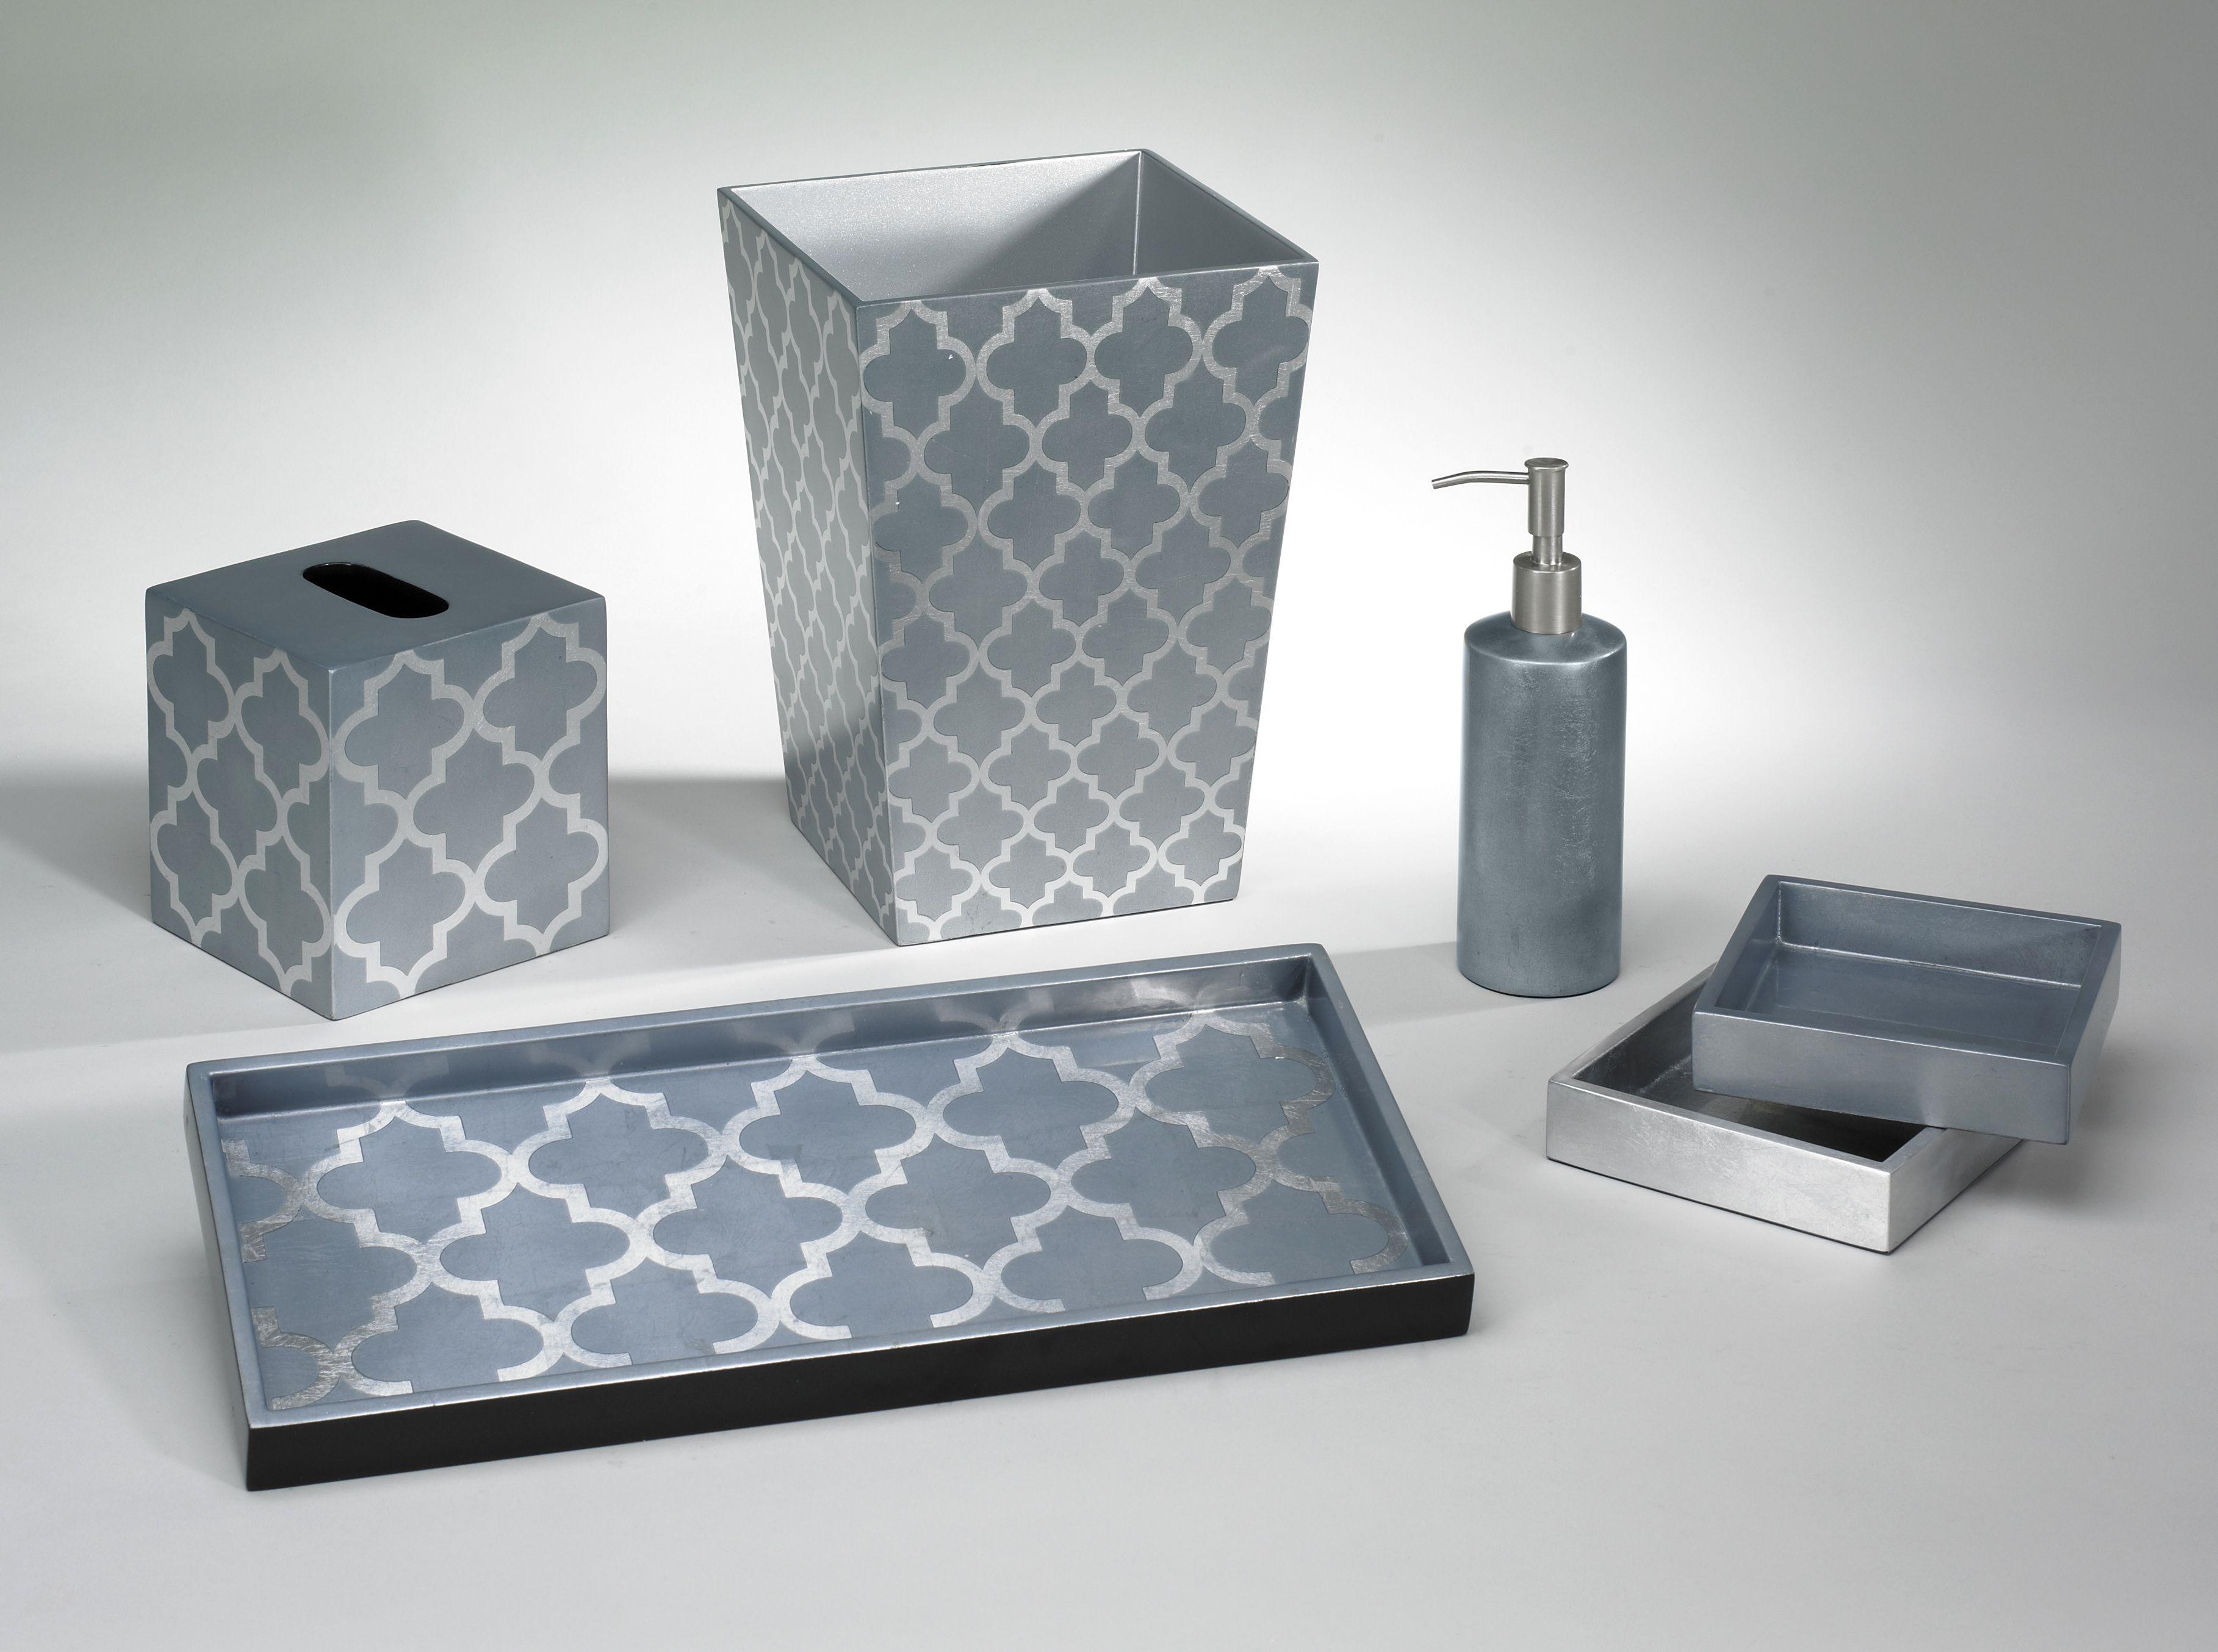 silver bathroom accessories delonho dcfeeaebdd silver bathroom accessories delonho  blue bath towels bathroom decor tsc. Silver Bathroom Accessories Delonho